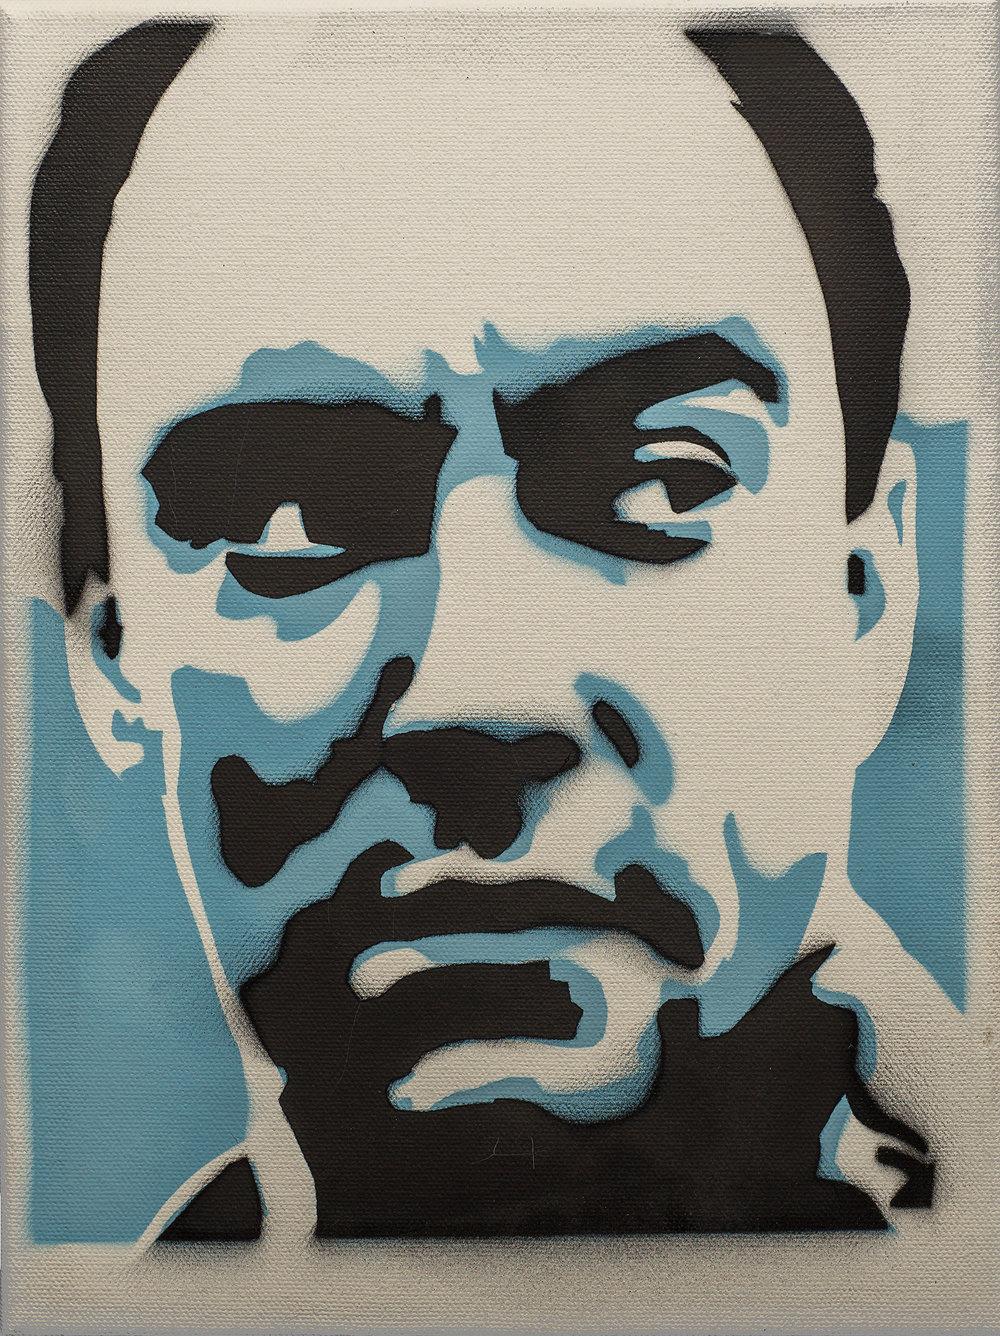 "Dave Mathews - Spraypaint on canvas 9"" x 12"""